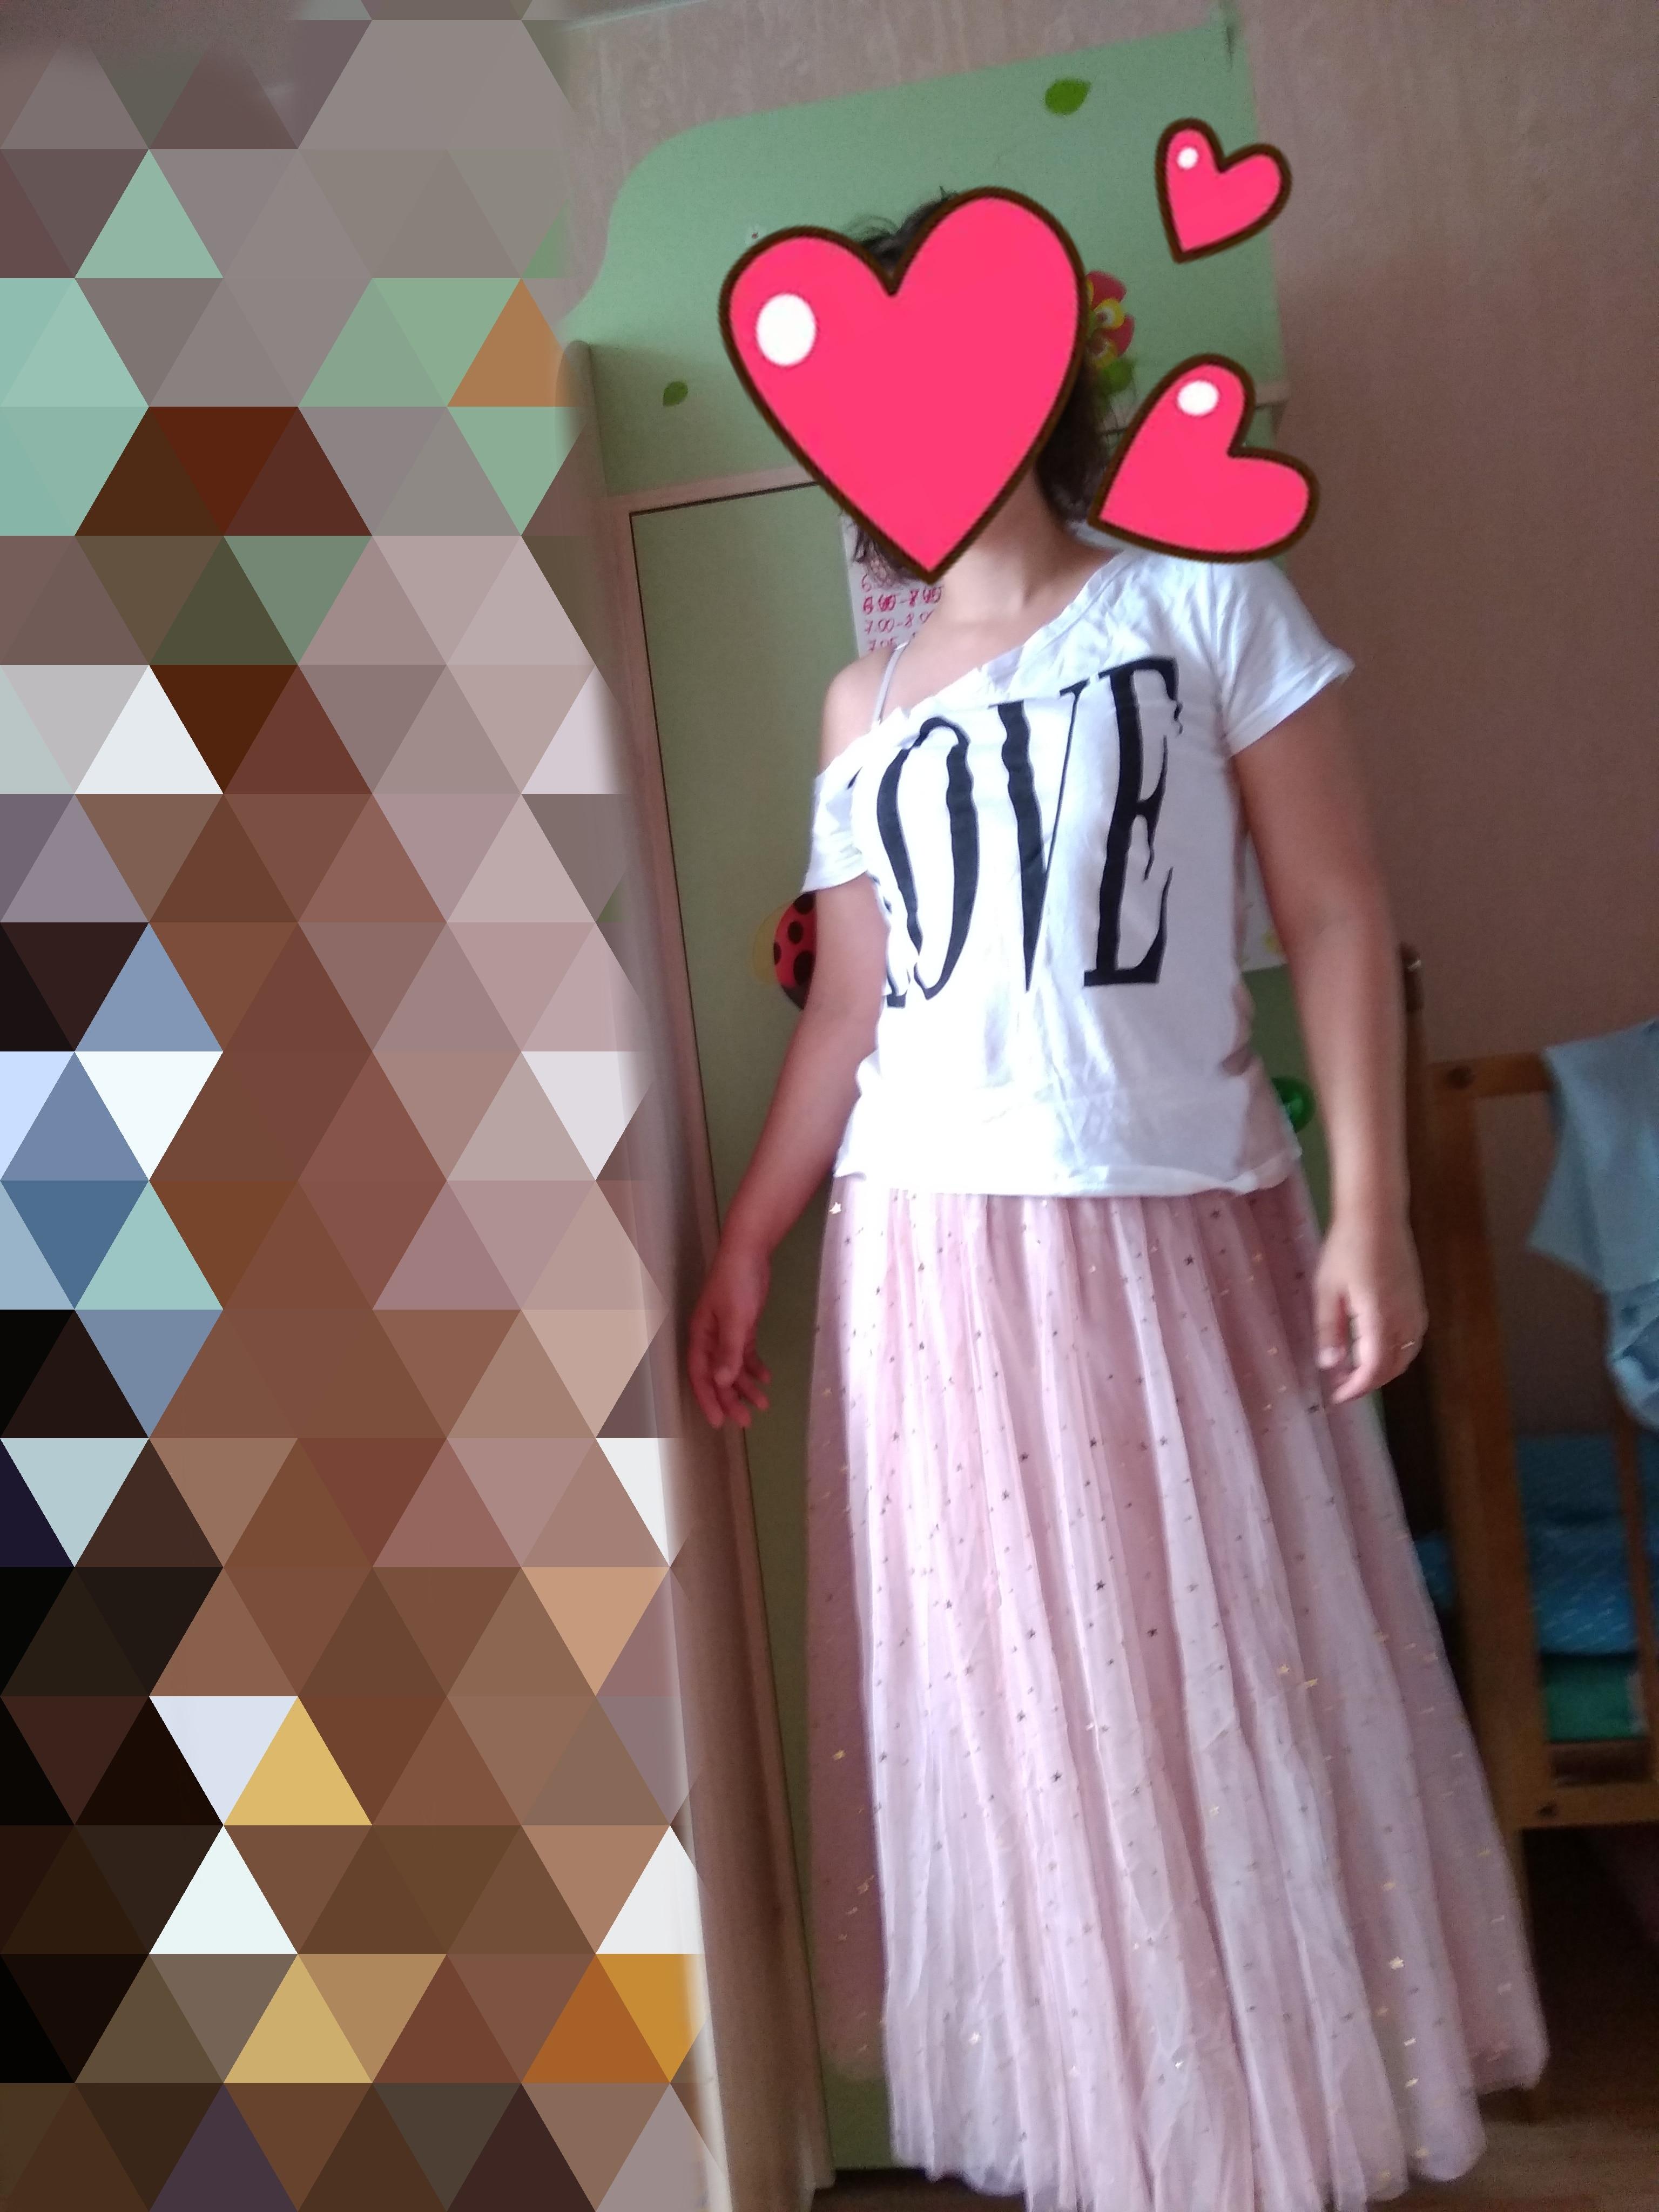 Spring Tulle Skirts Womens Fashion Shining Star Mesh Tutu Skirt Pleated Long Skirts Midi Skirt Saias Faldas Jupe Femme photo review